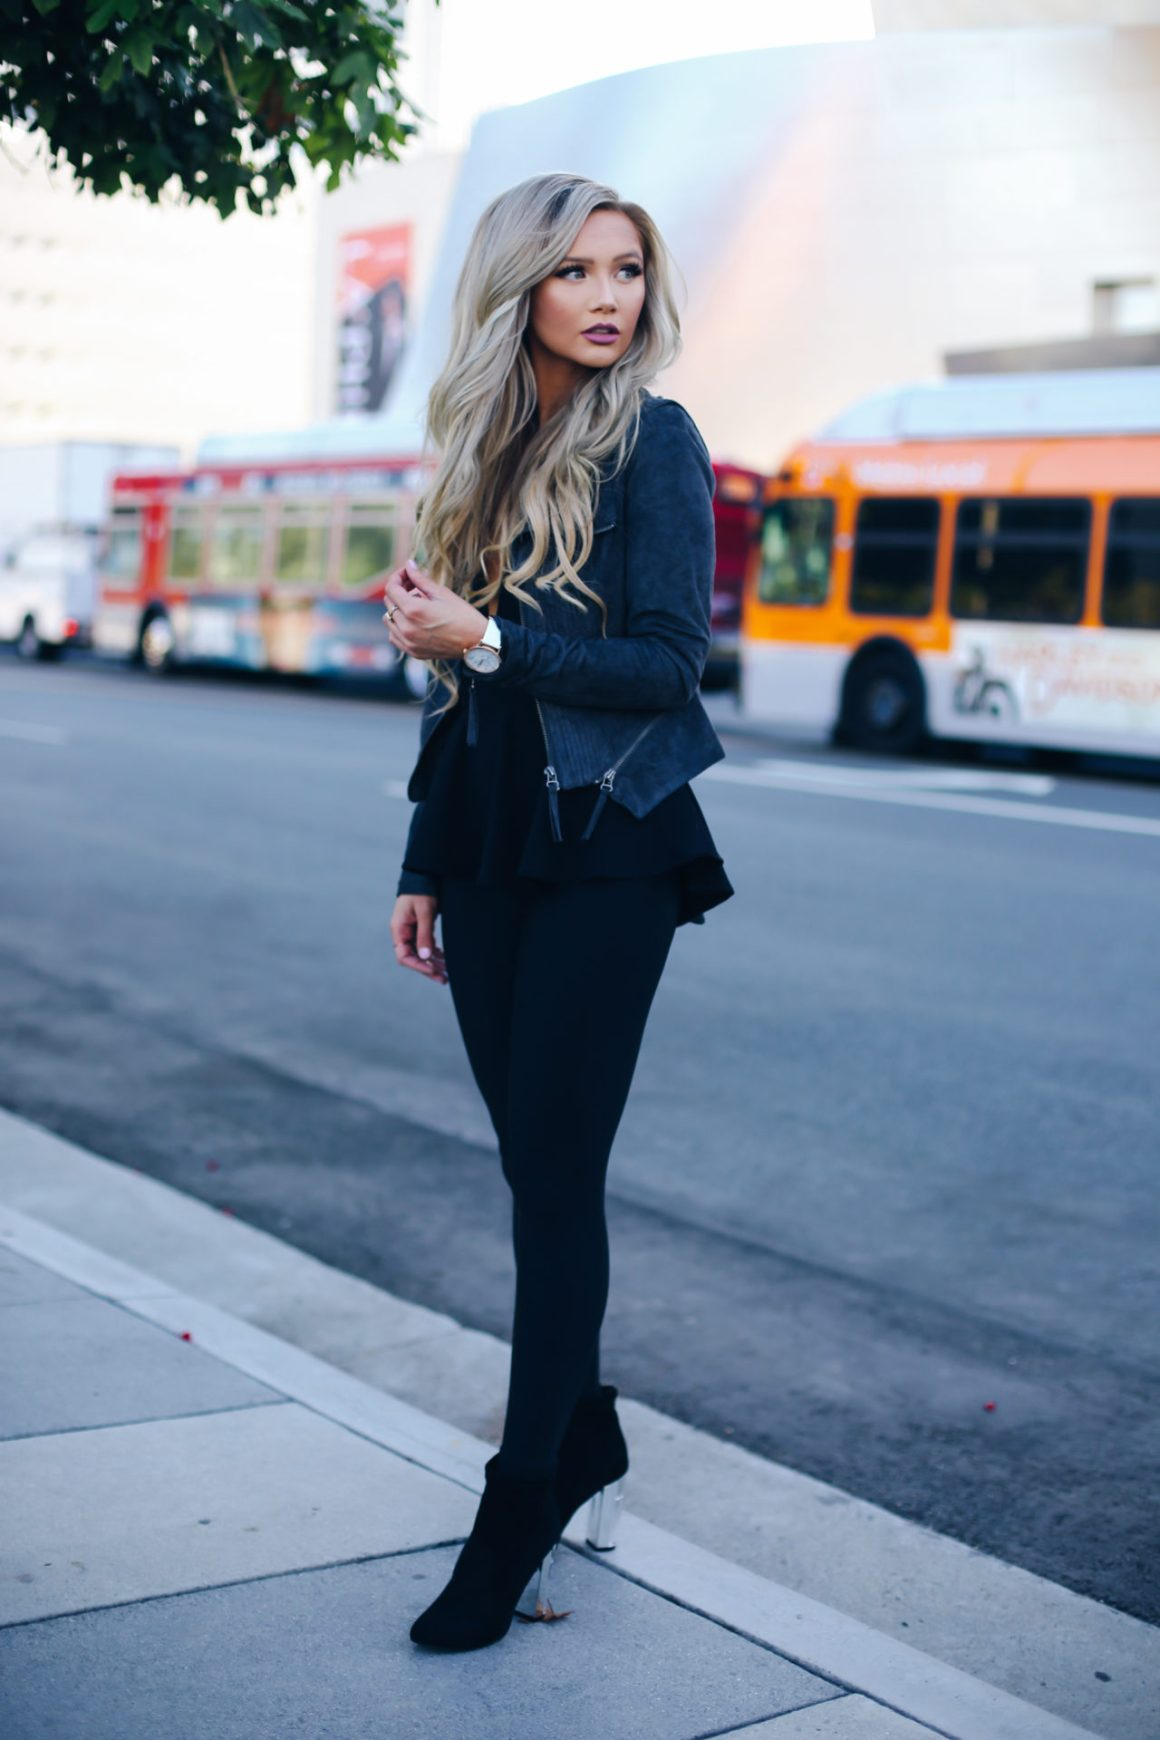 Black-Peplum-leggings-stephanie-danielle-thecityblonde-ryanbyryanchua-4533